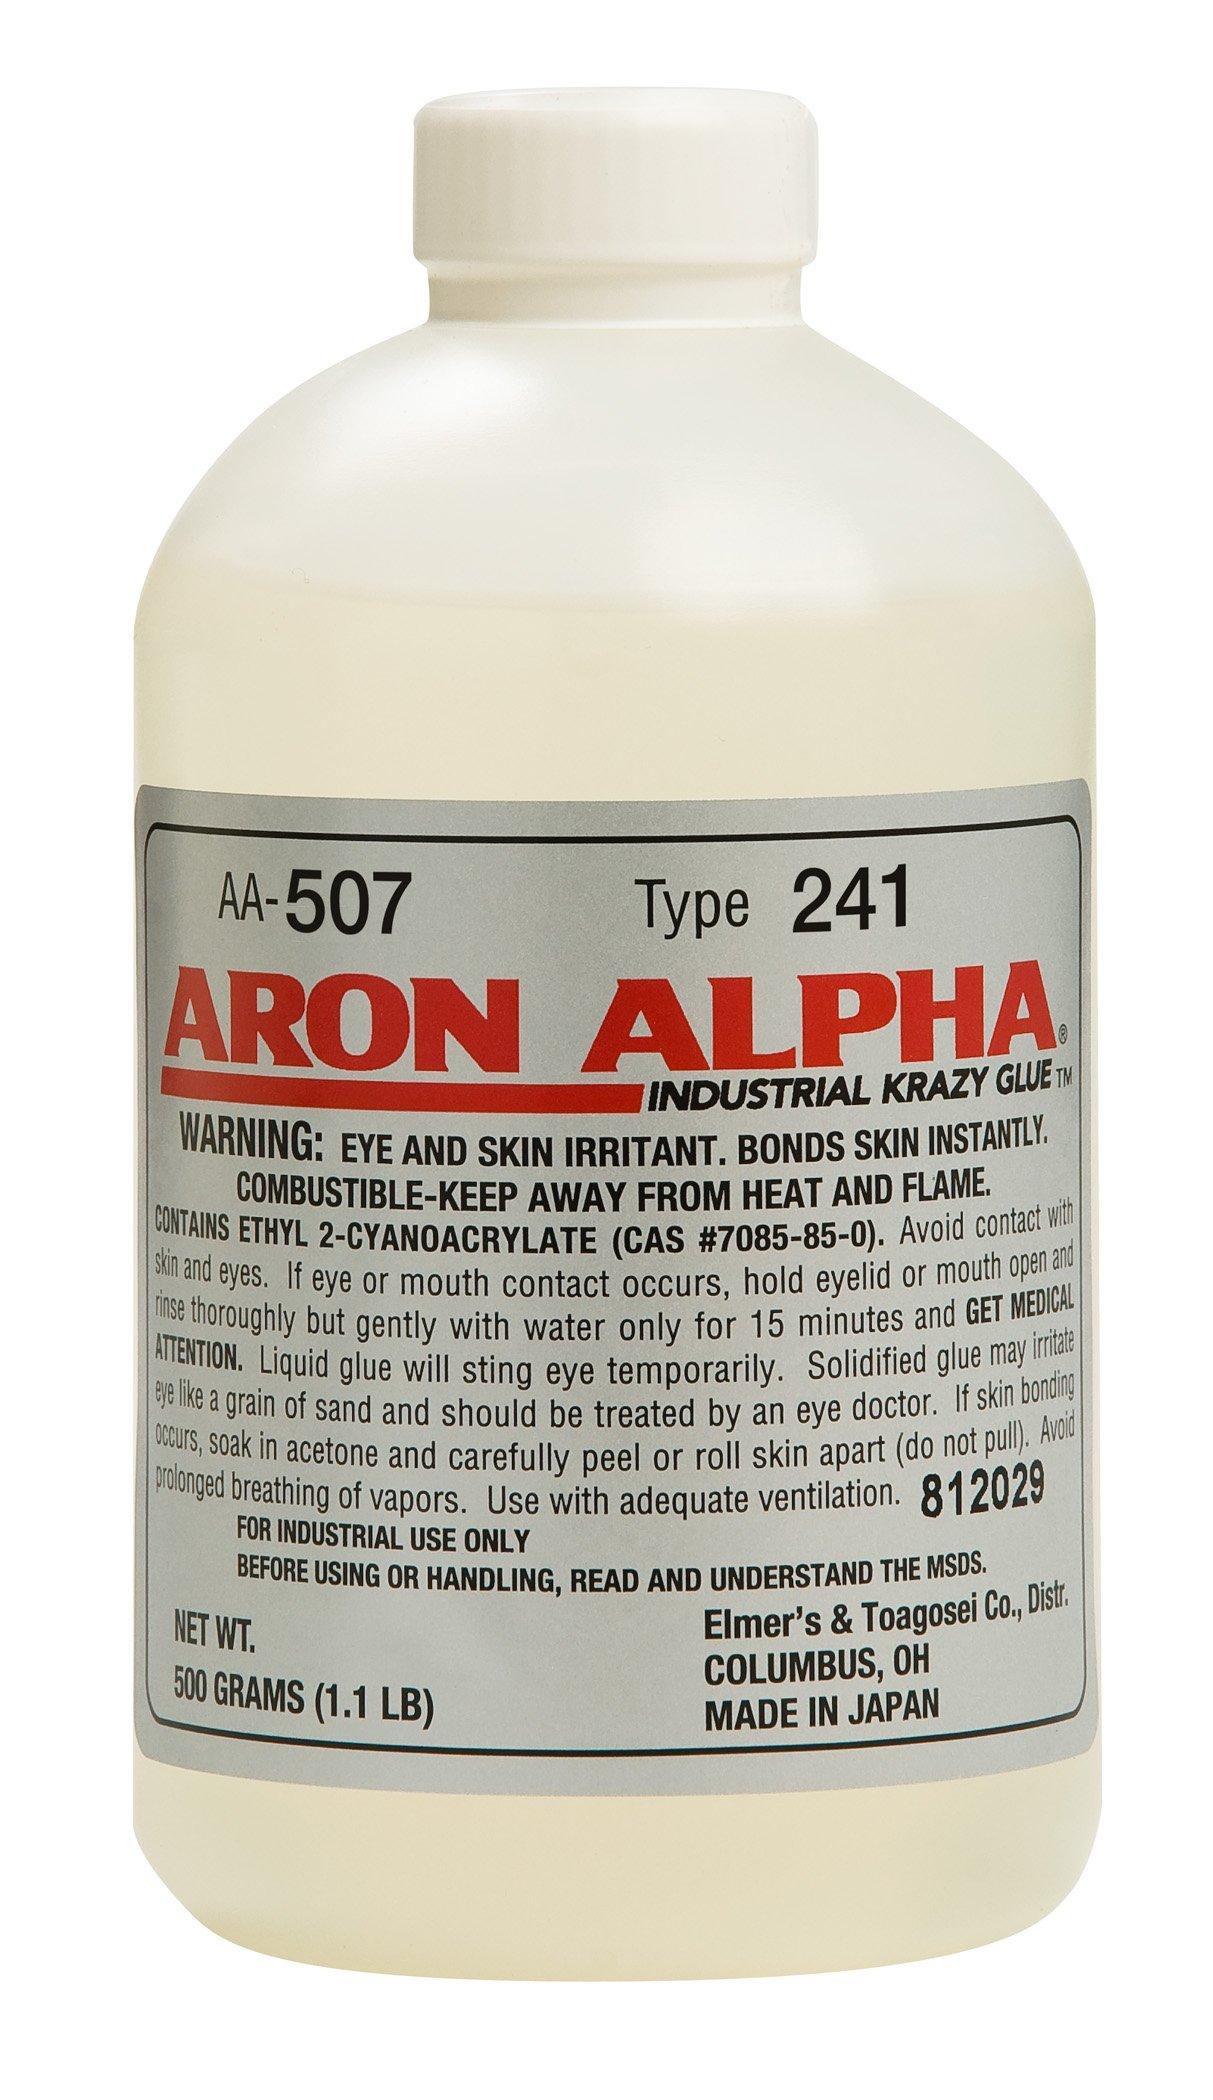 Aron Alpha Type 241 (40 cps) Regular Set Instant Adhesive 500 g (1.1 pound) Bottle